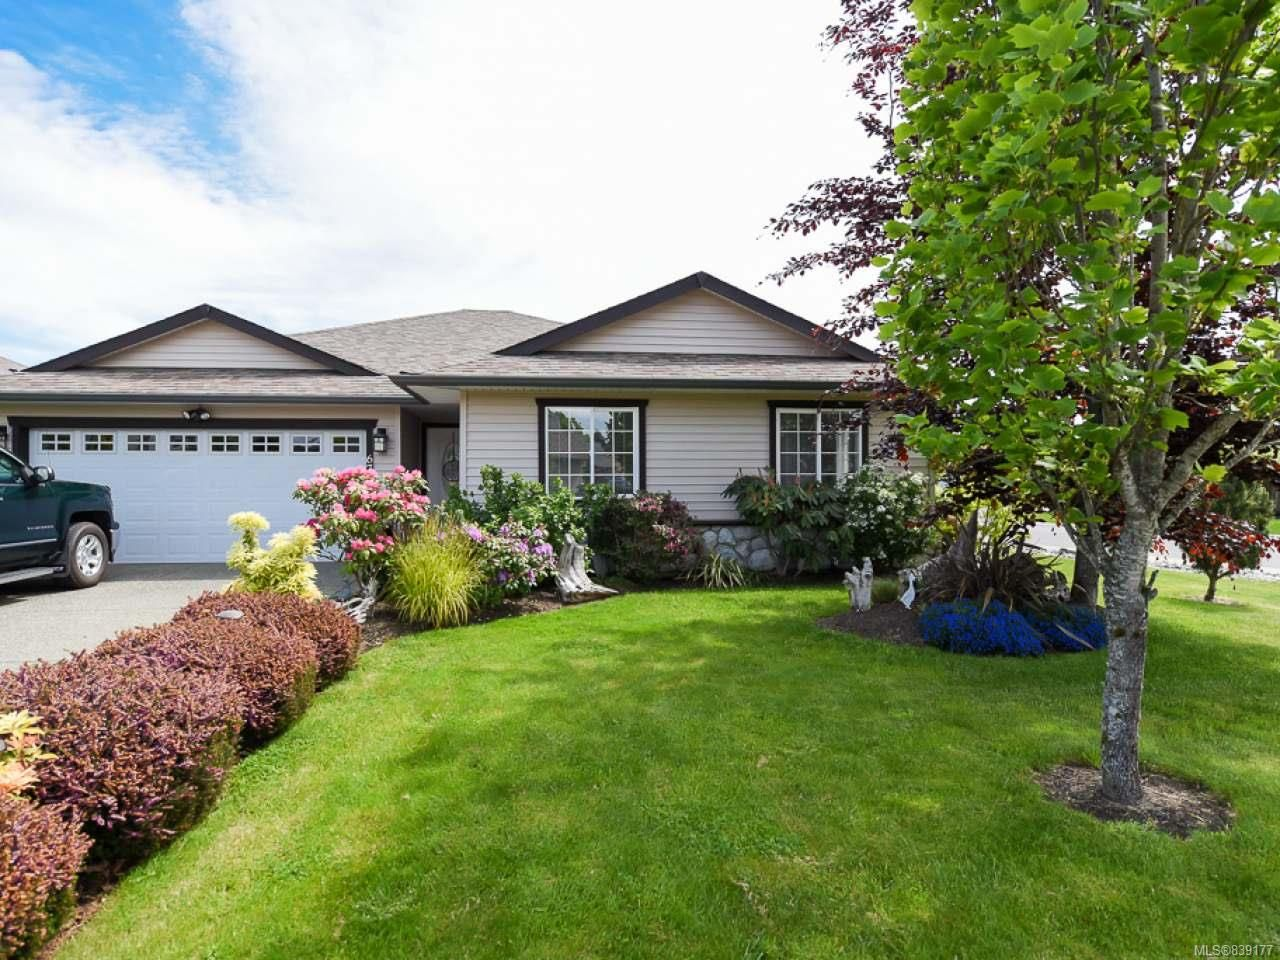 Main Photo: 678 Lancaster Way in COMOX: CV Comox (Town of) House for sale (Comox Valley)  : MLS®# 839177